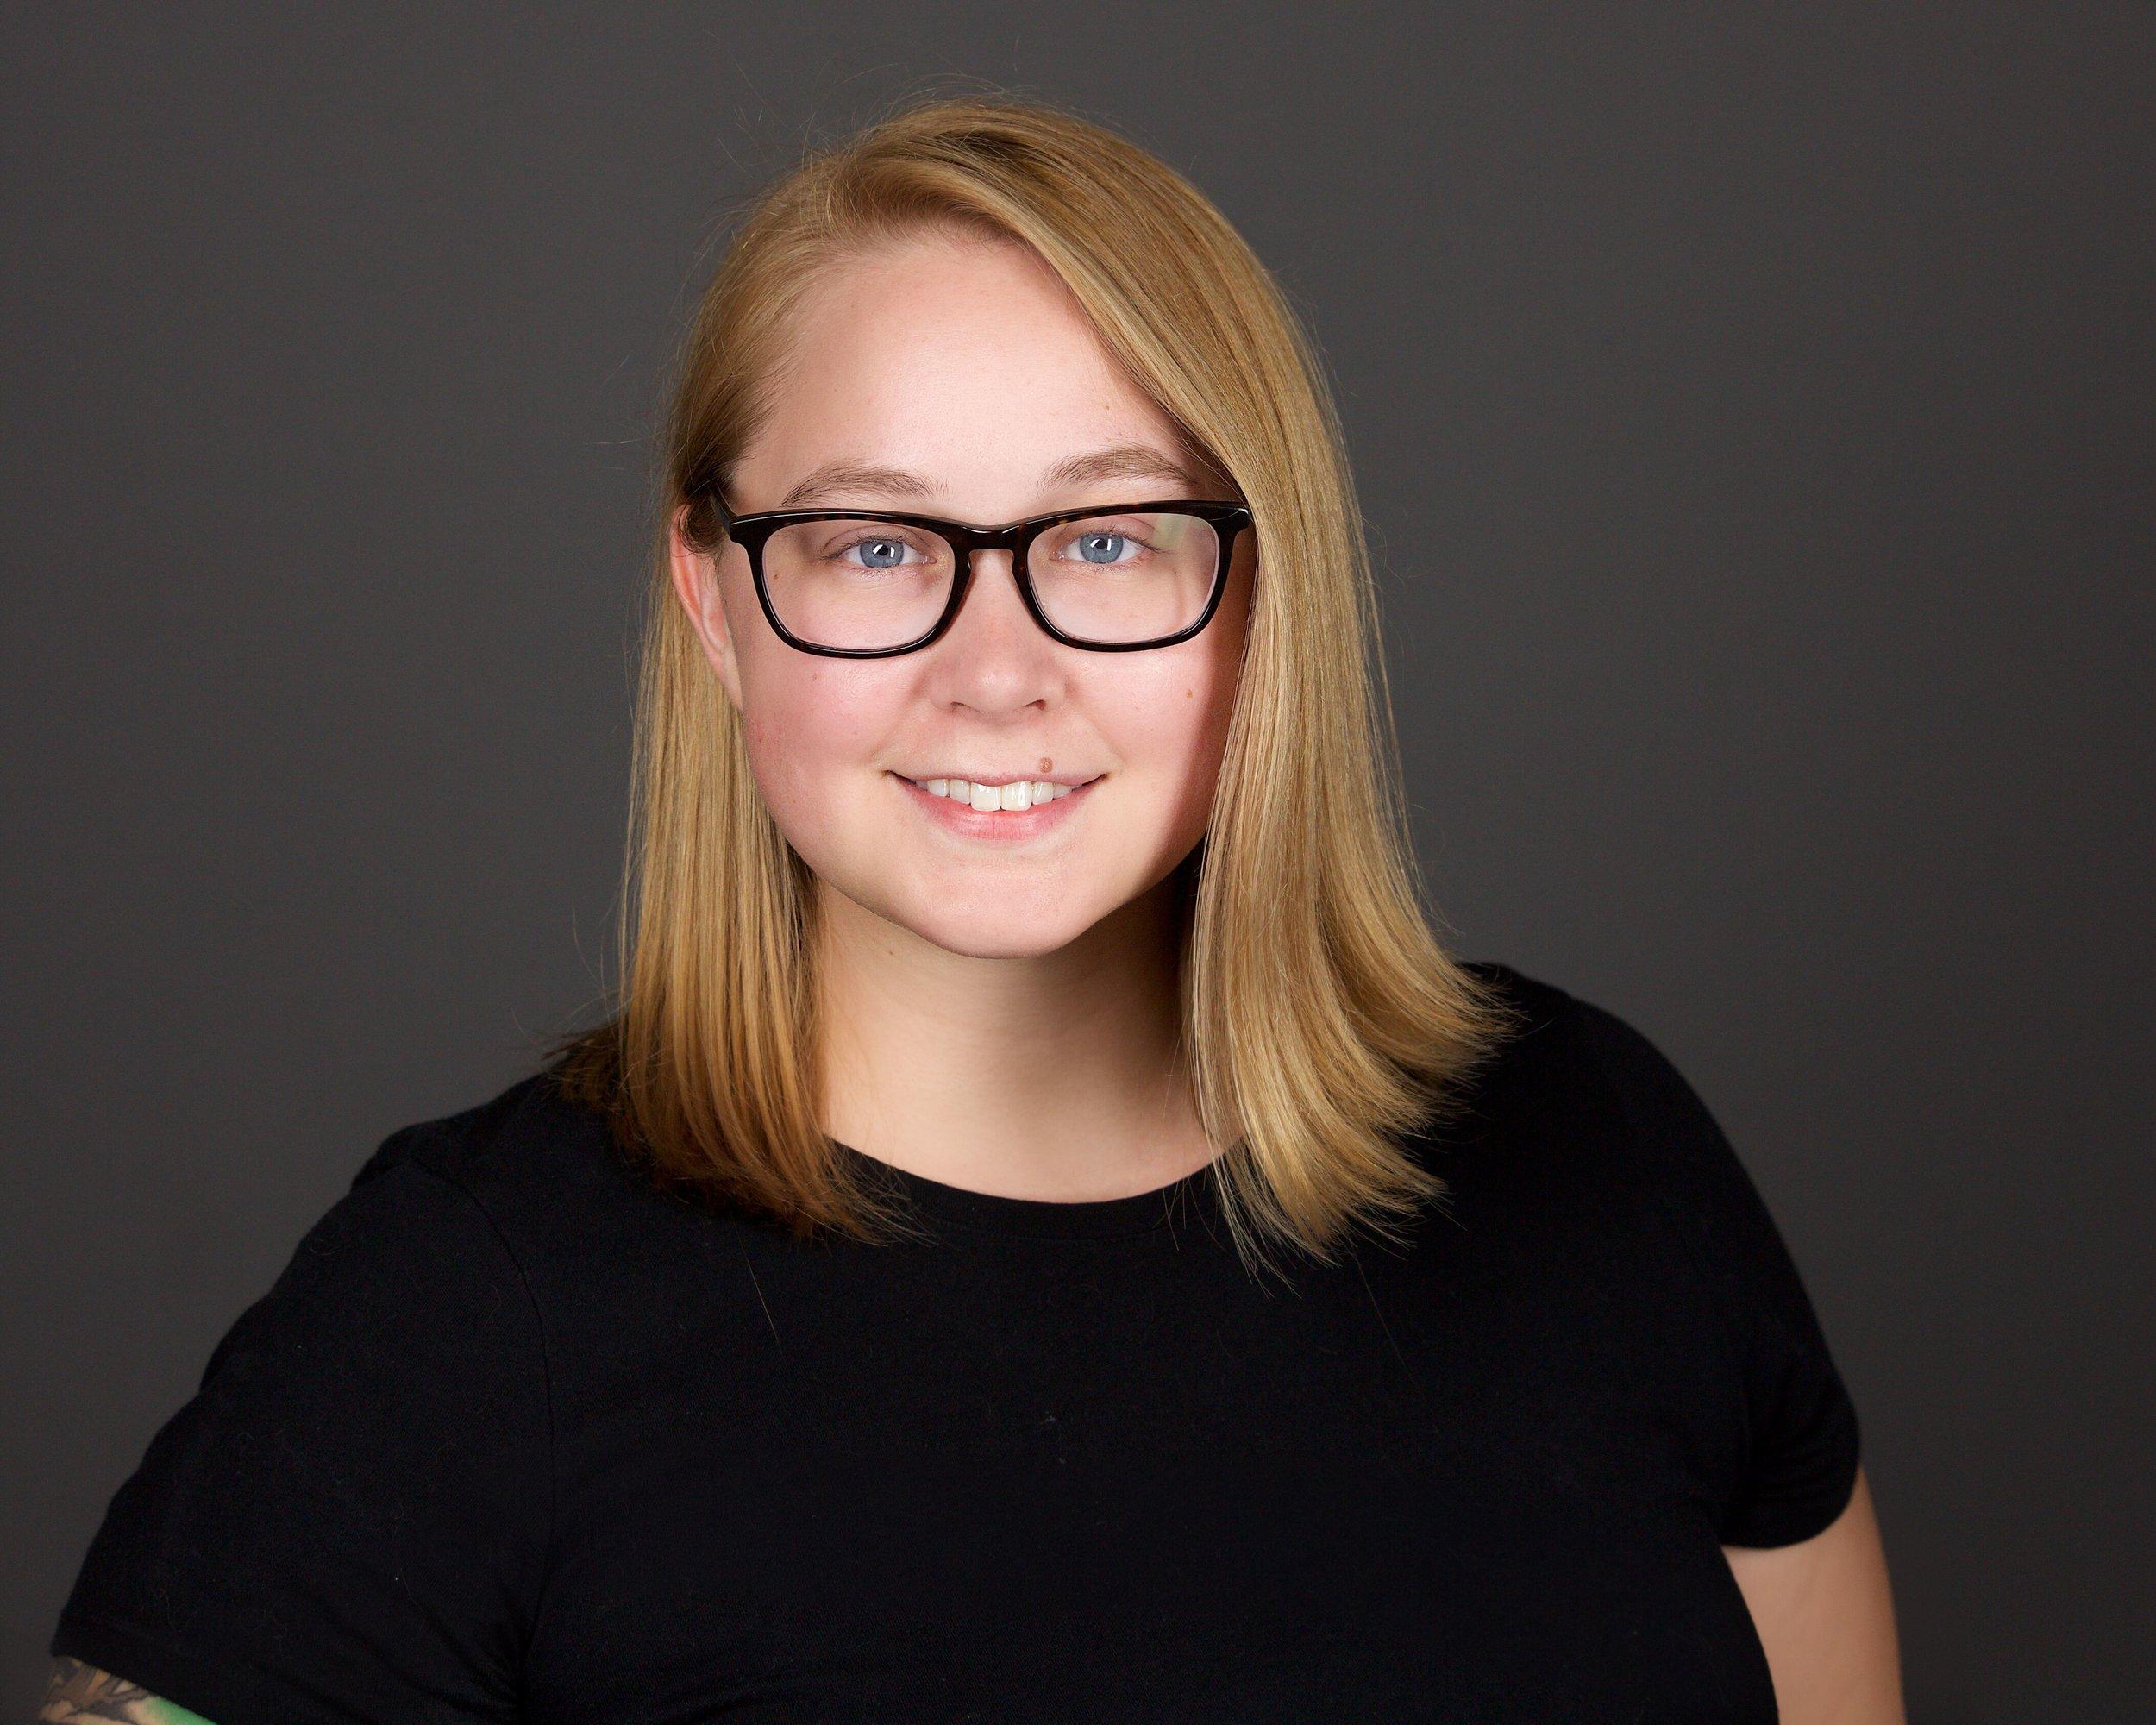 Abby Mutschler - Senior Editor